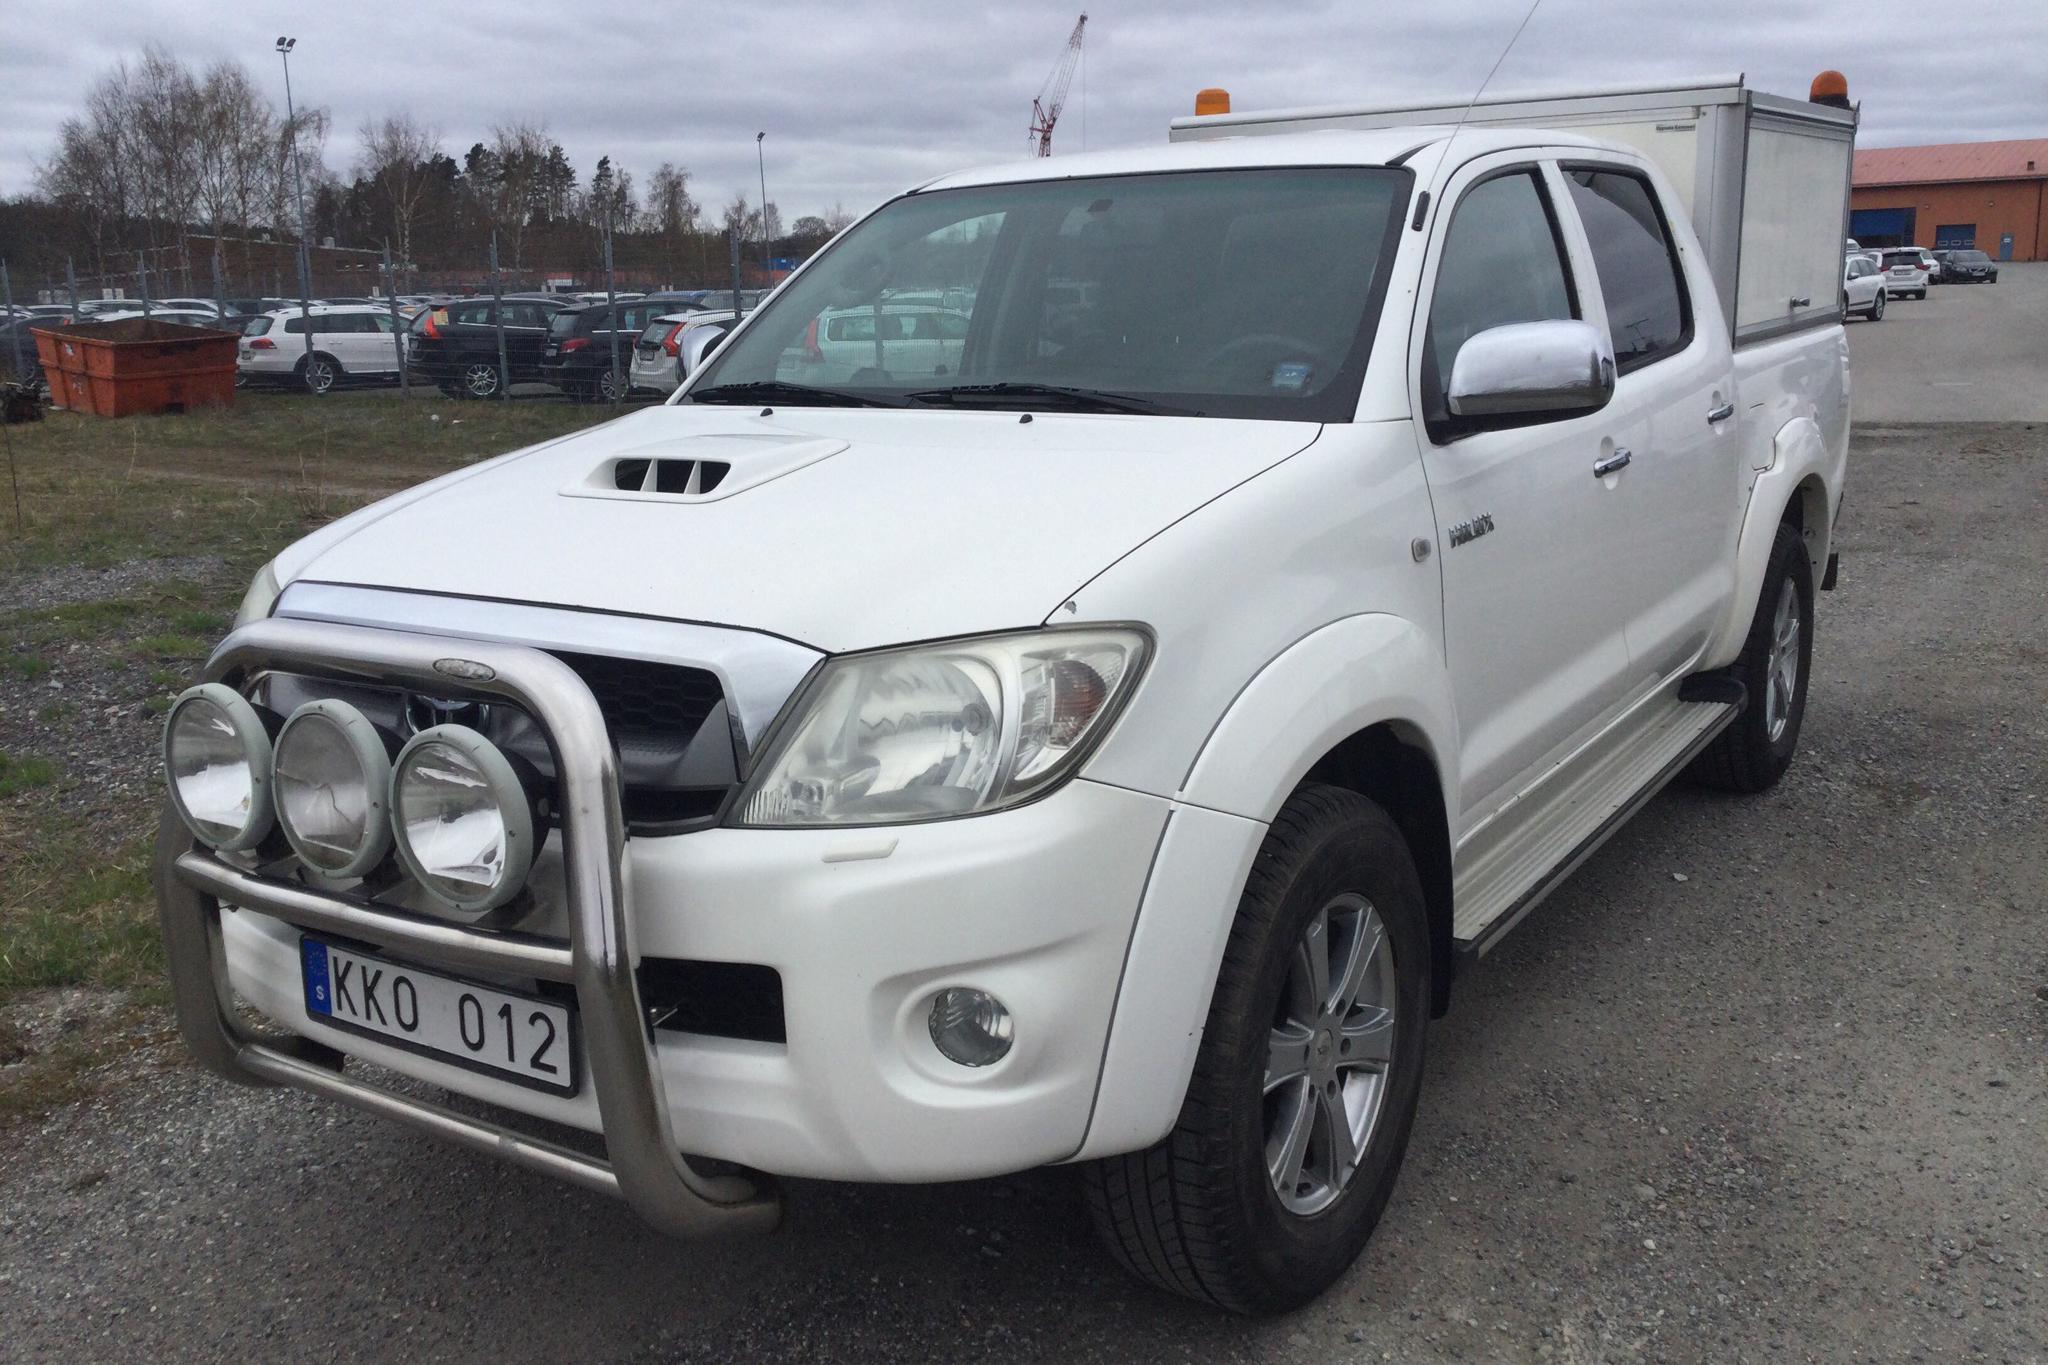 Toyota Hilux 3.0 D-4D 4WD (171hk) - 234 220 km - Automatic - white - 2011